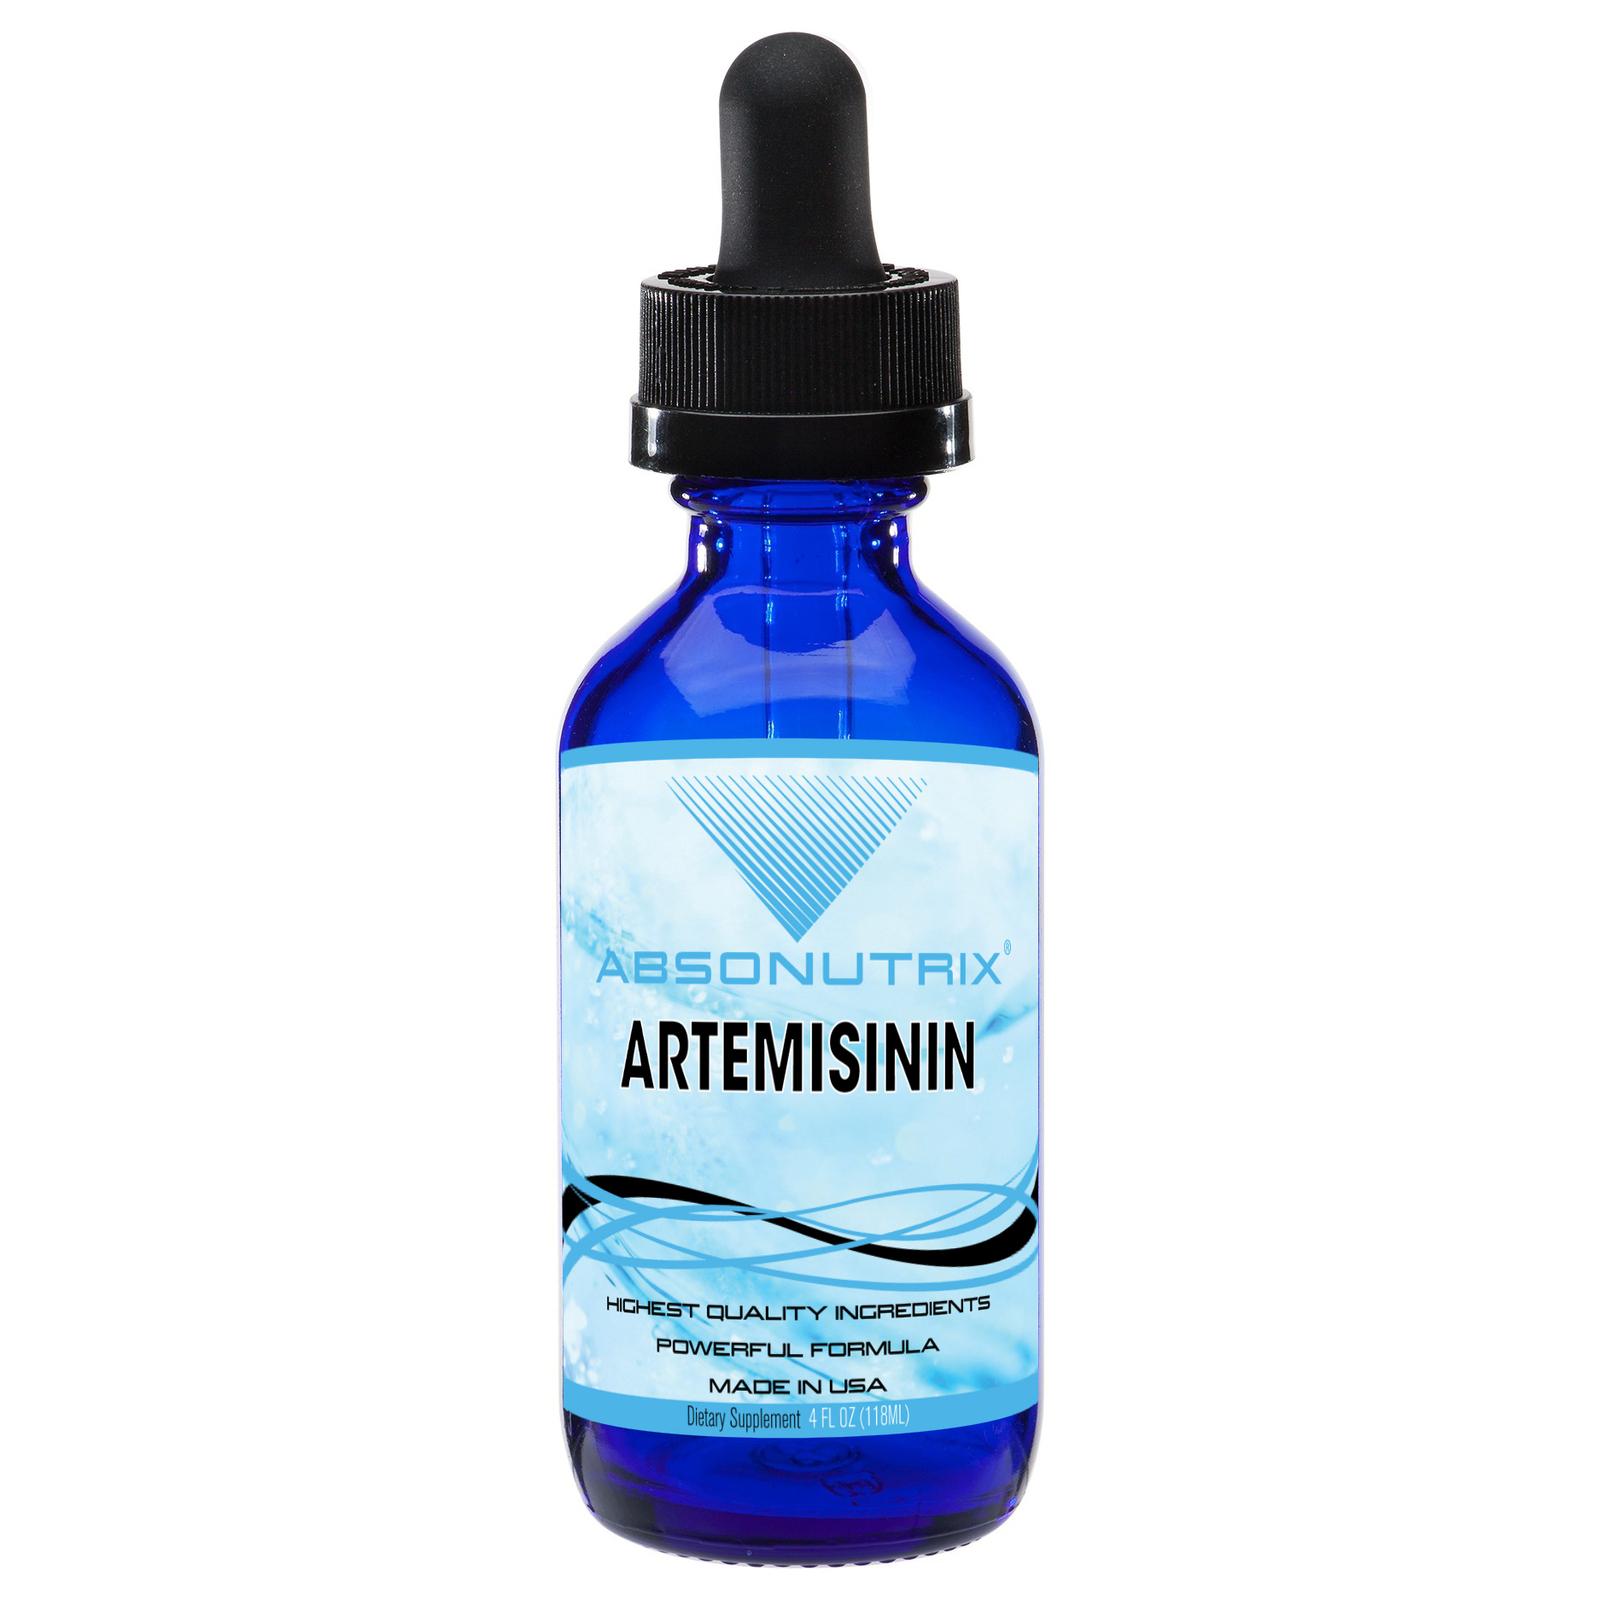 Absonutrix Artemisinin 593mg 4Fl Oz relieve inflammation and boost immunity USA - $36.99